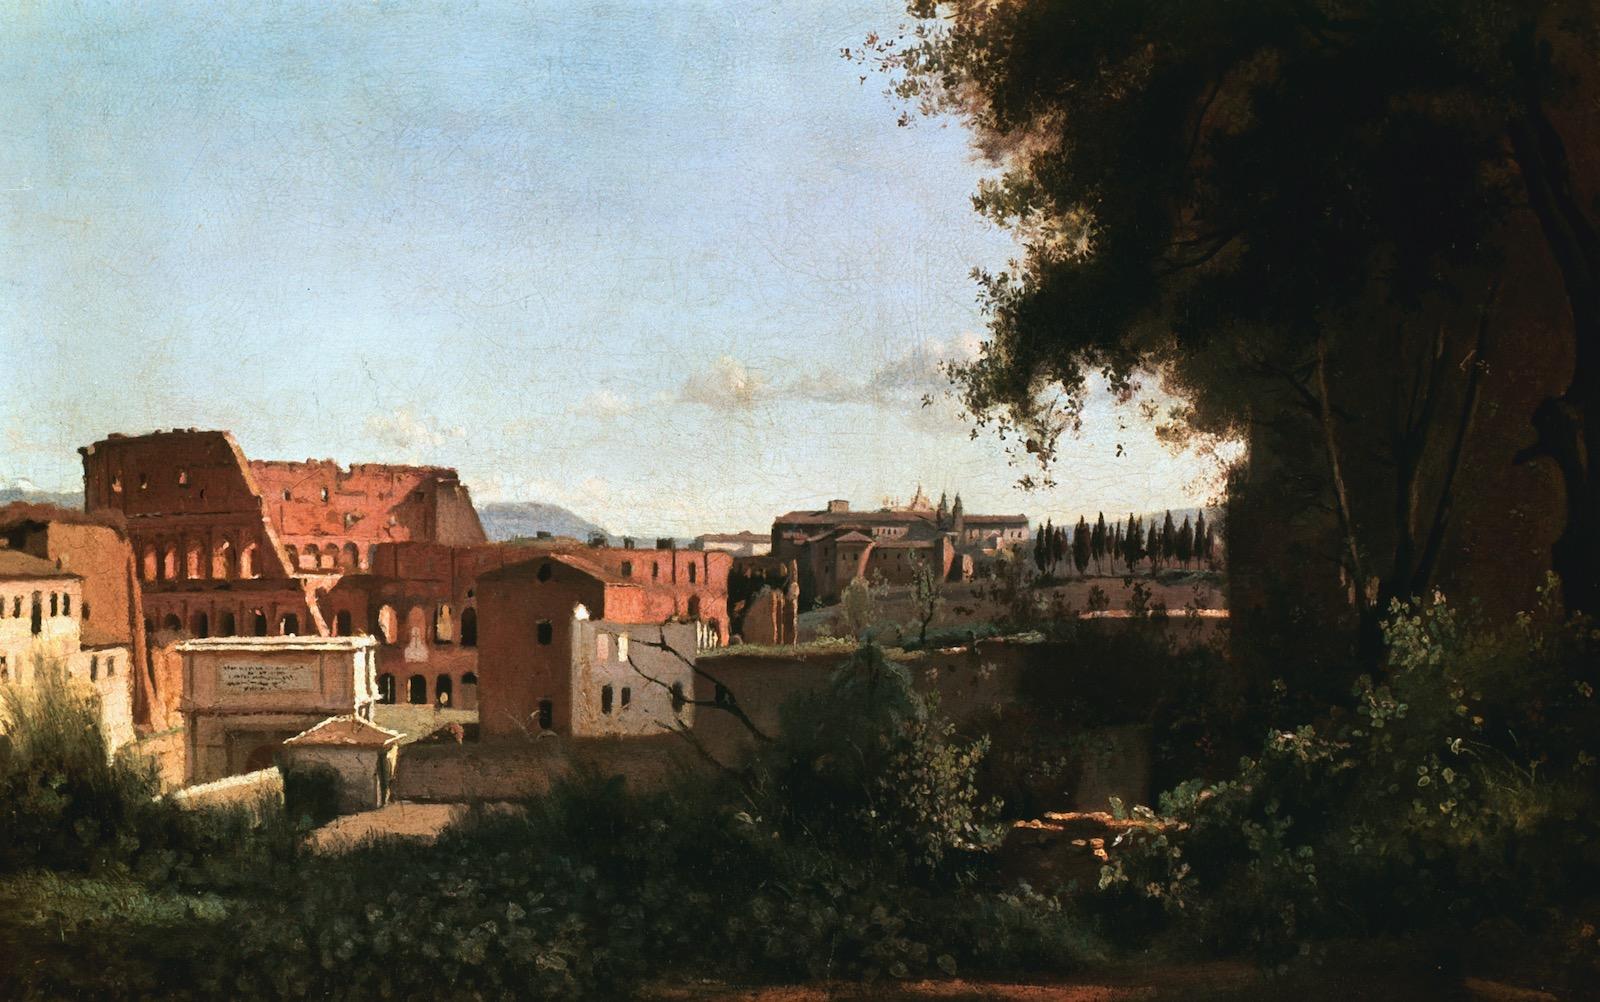 The Hawthornes Visit the Colosseum